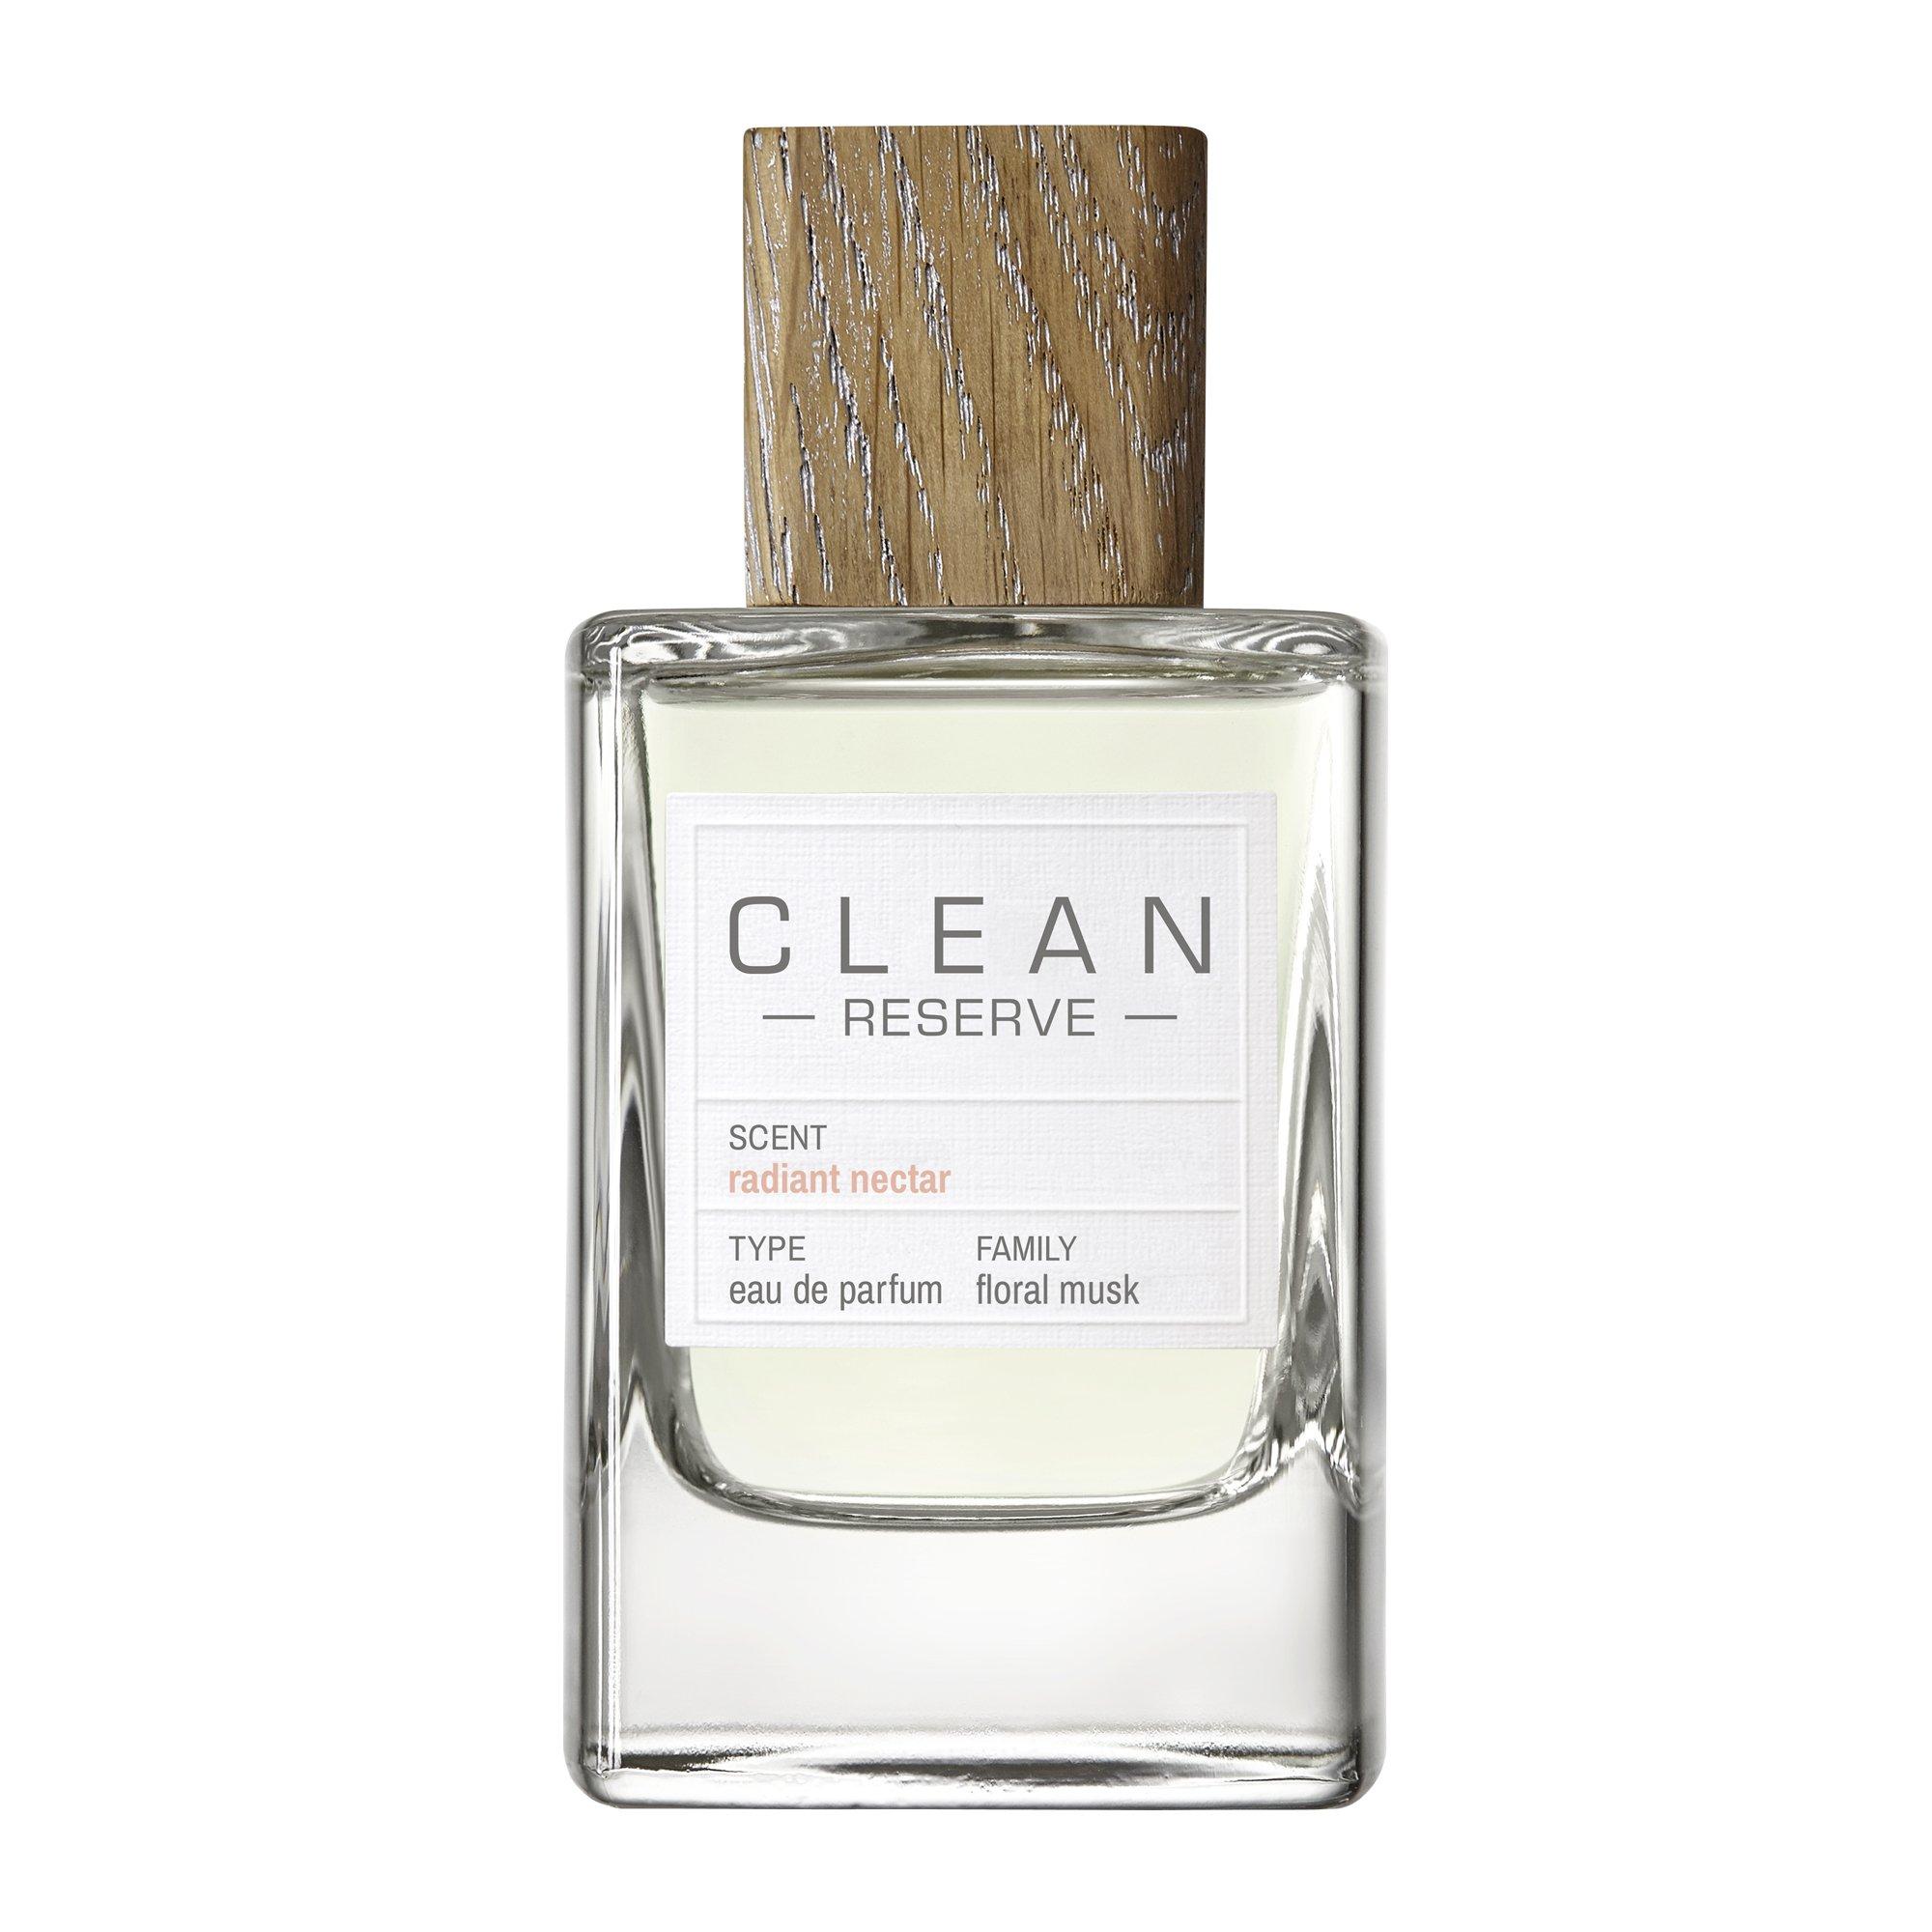 Clean Reserve - Radiant Nectar EDP 100 ml